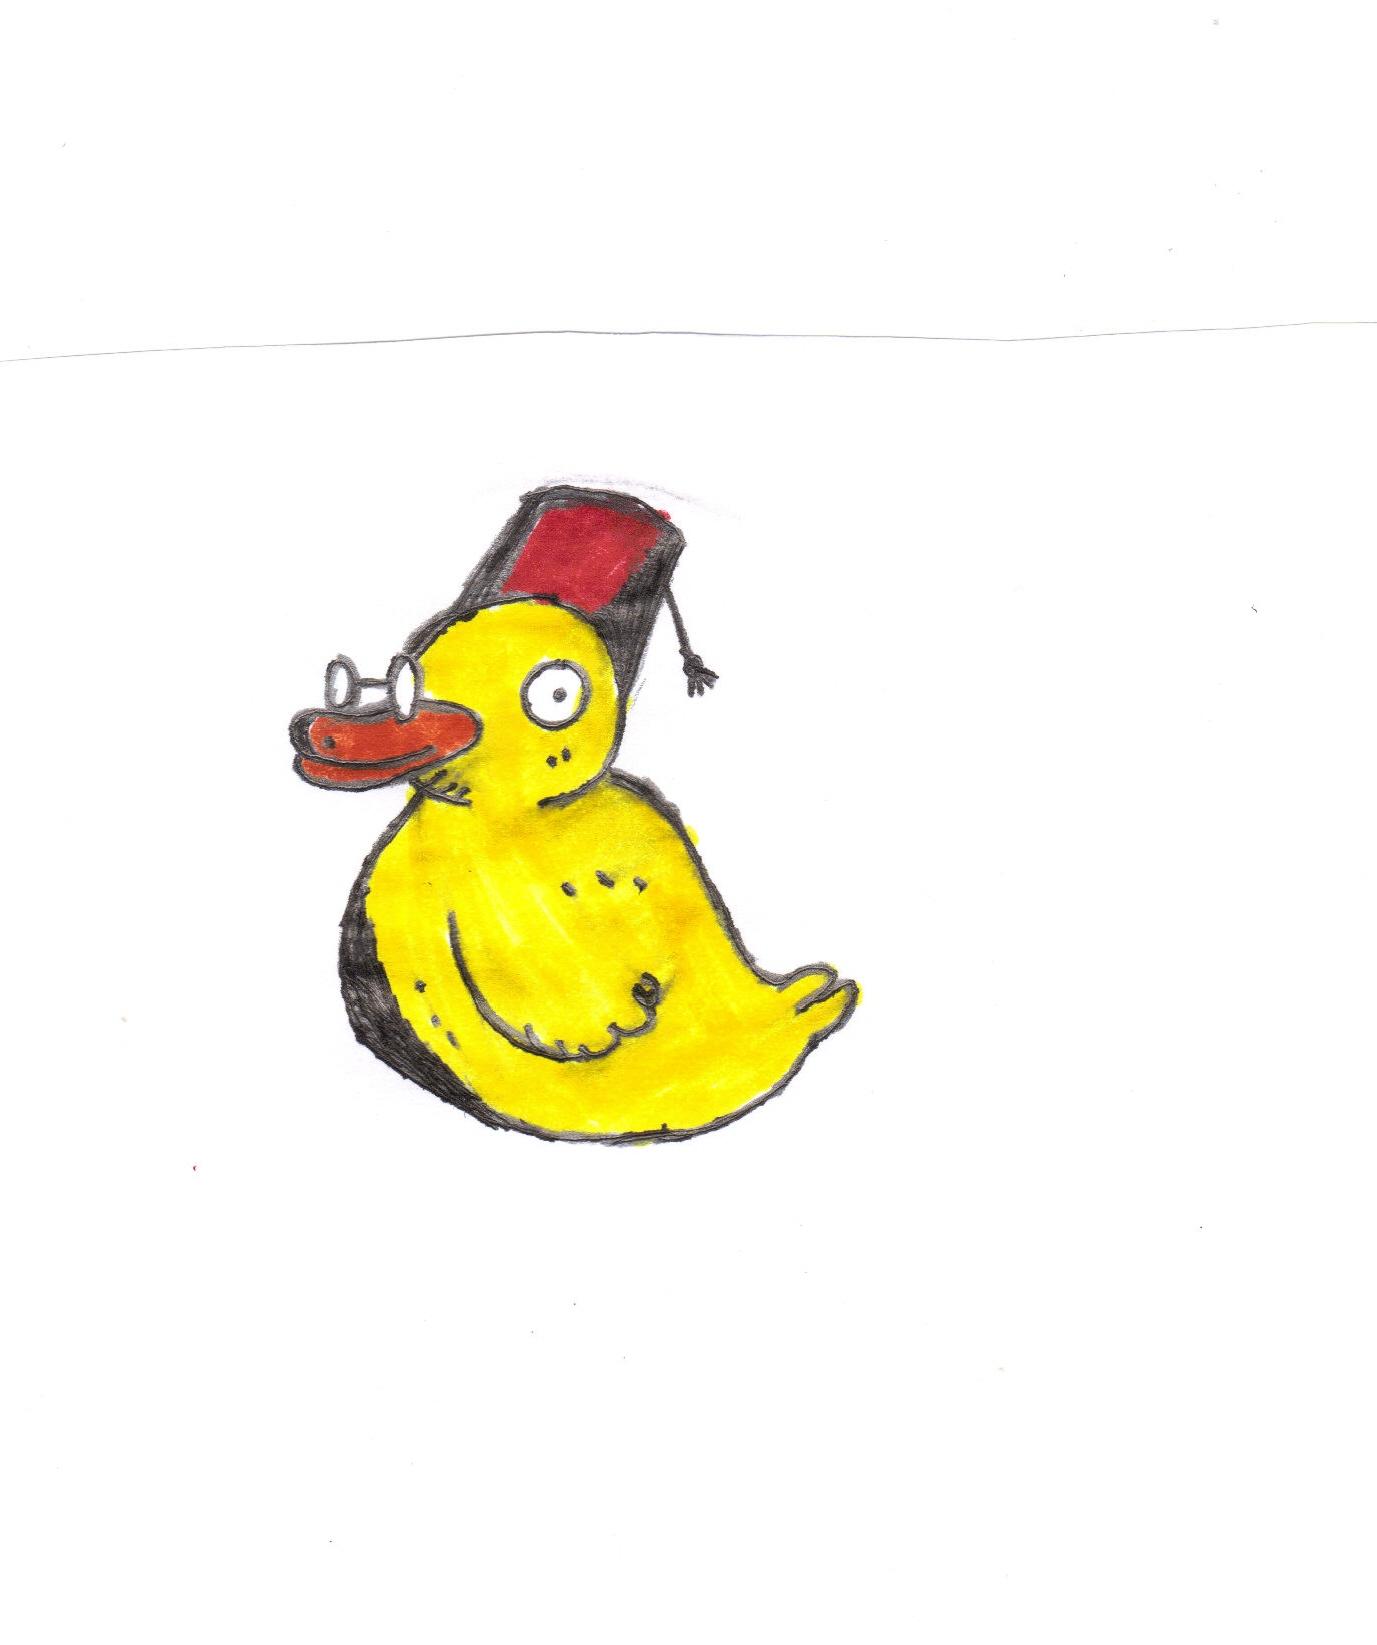 Rubber Ducky!